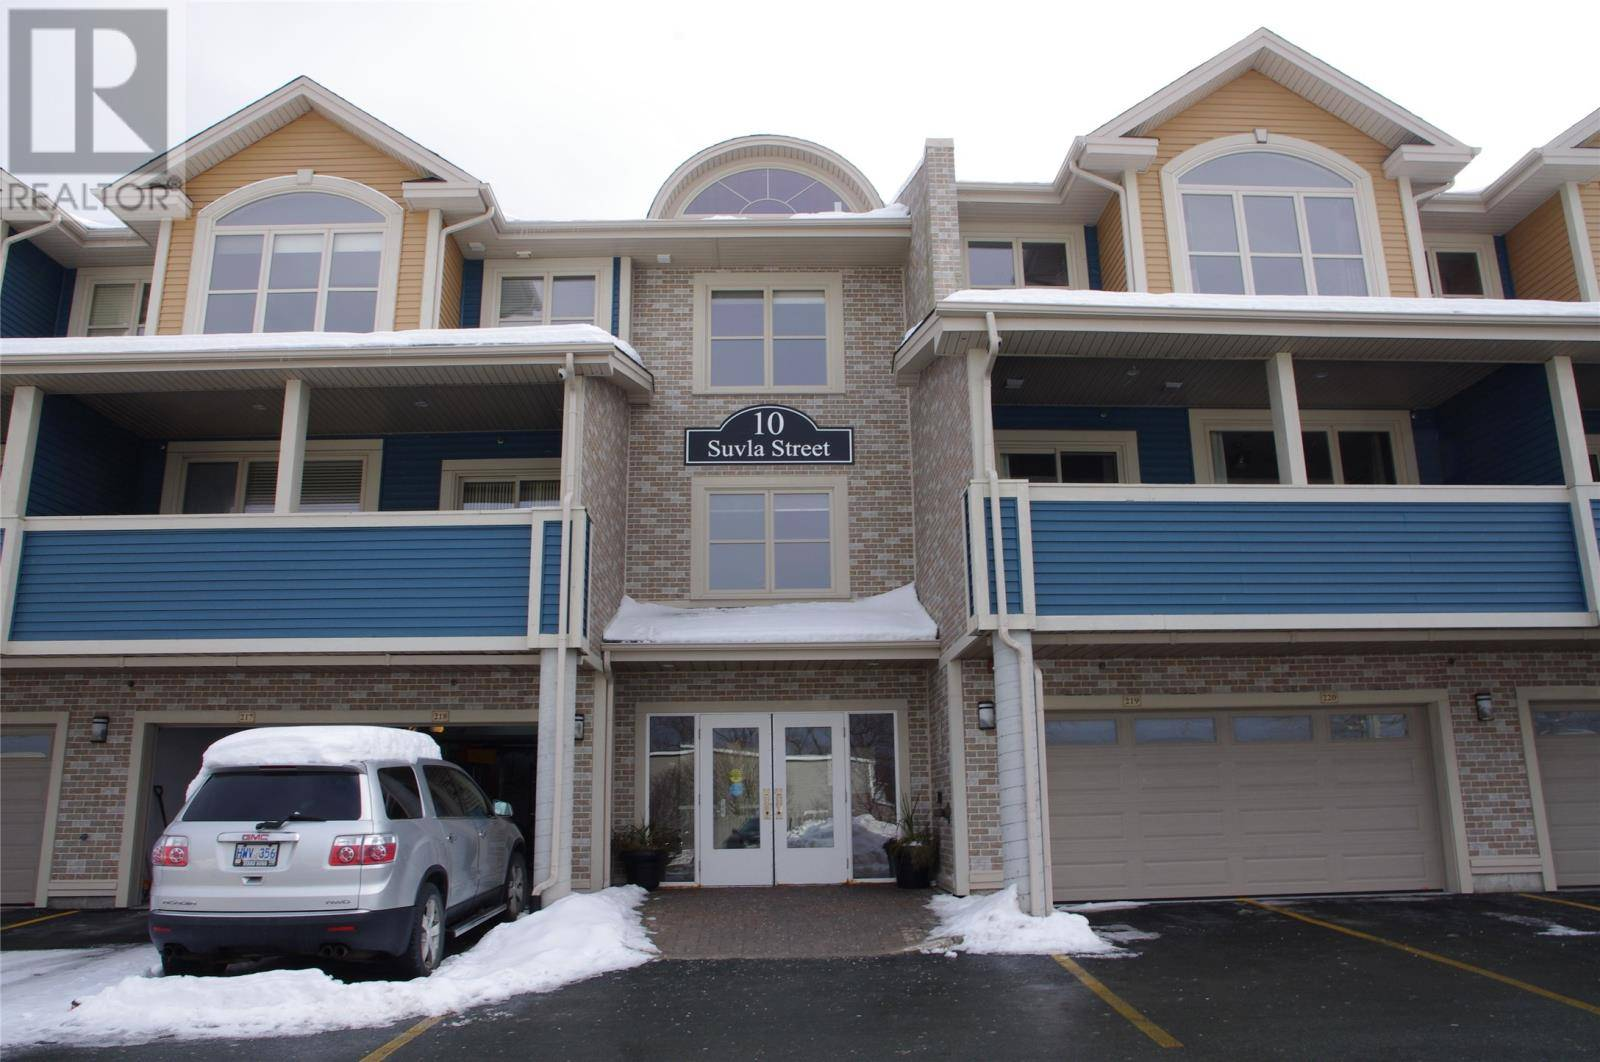 House for sale at 10 Suvla St Unit 212 St. John's Newfoundland - MLS: 1209203